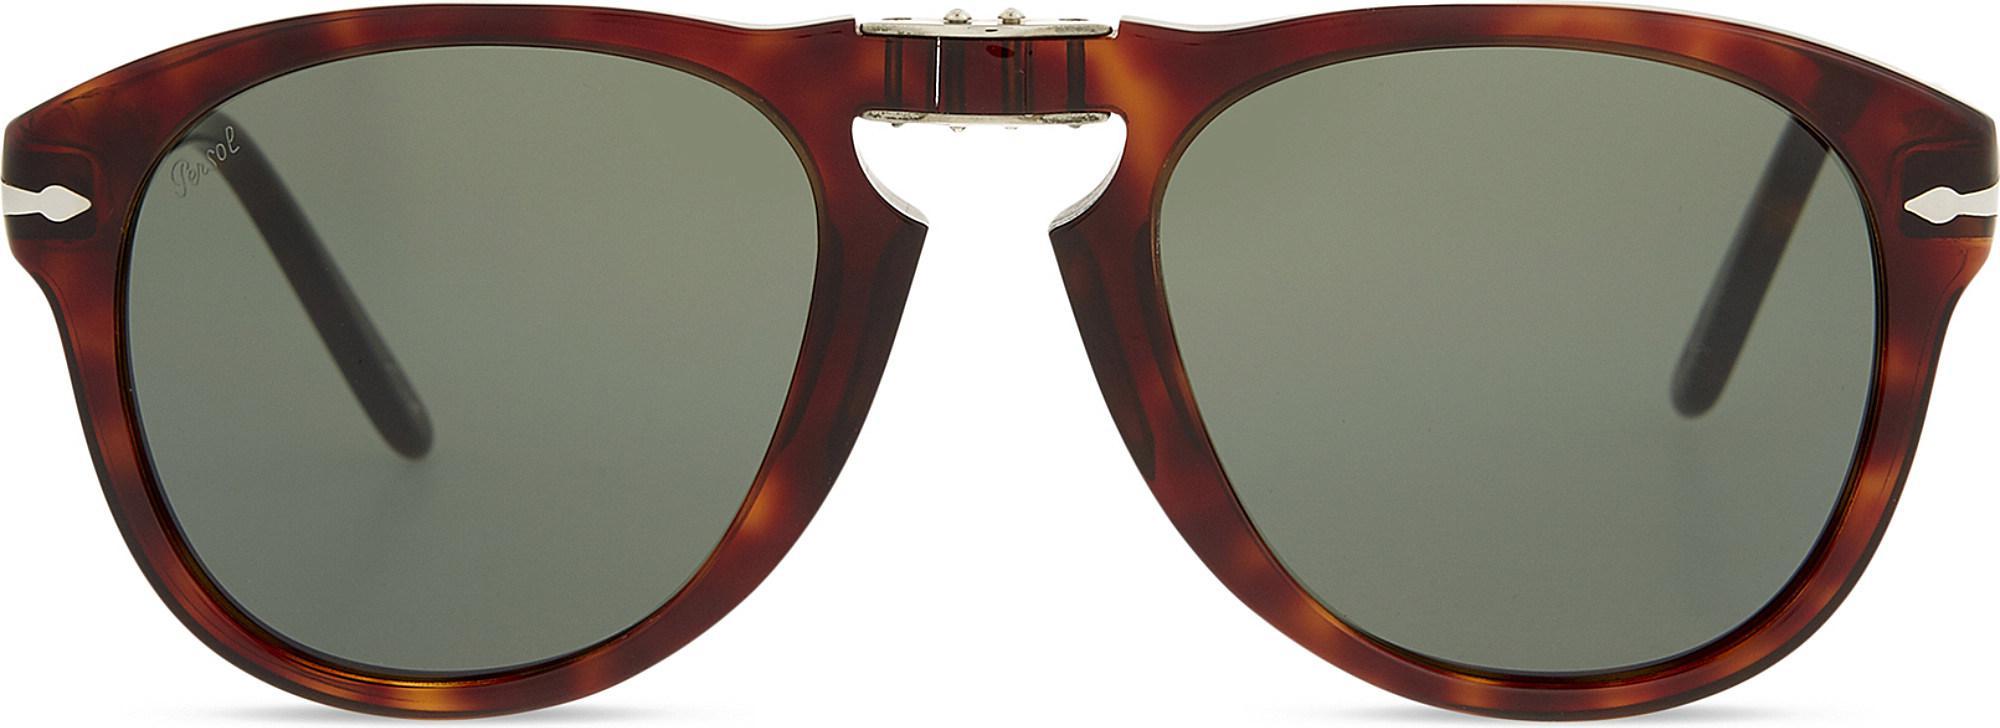 be06376fec Persol - Brown Po2431 Tortoiseshell Square-frame Sunglasses - Lyst. View  fullscreen